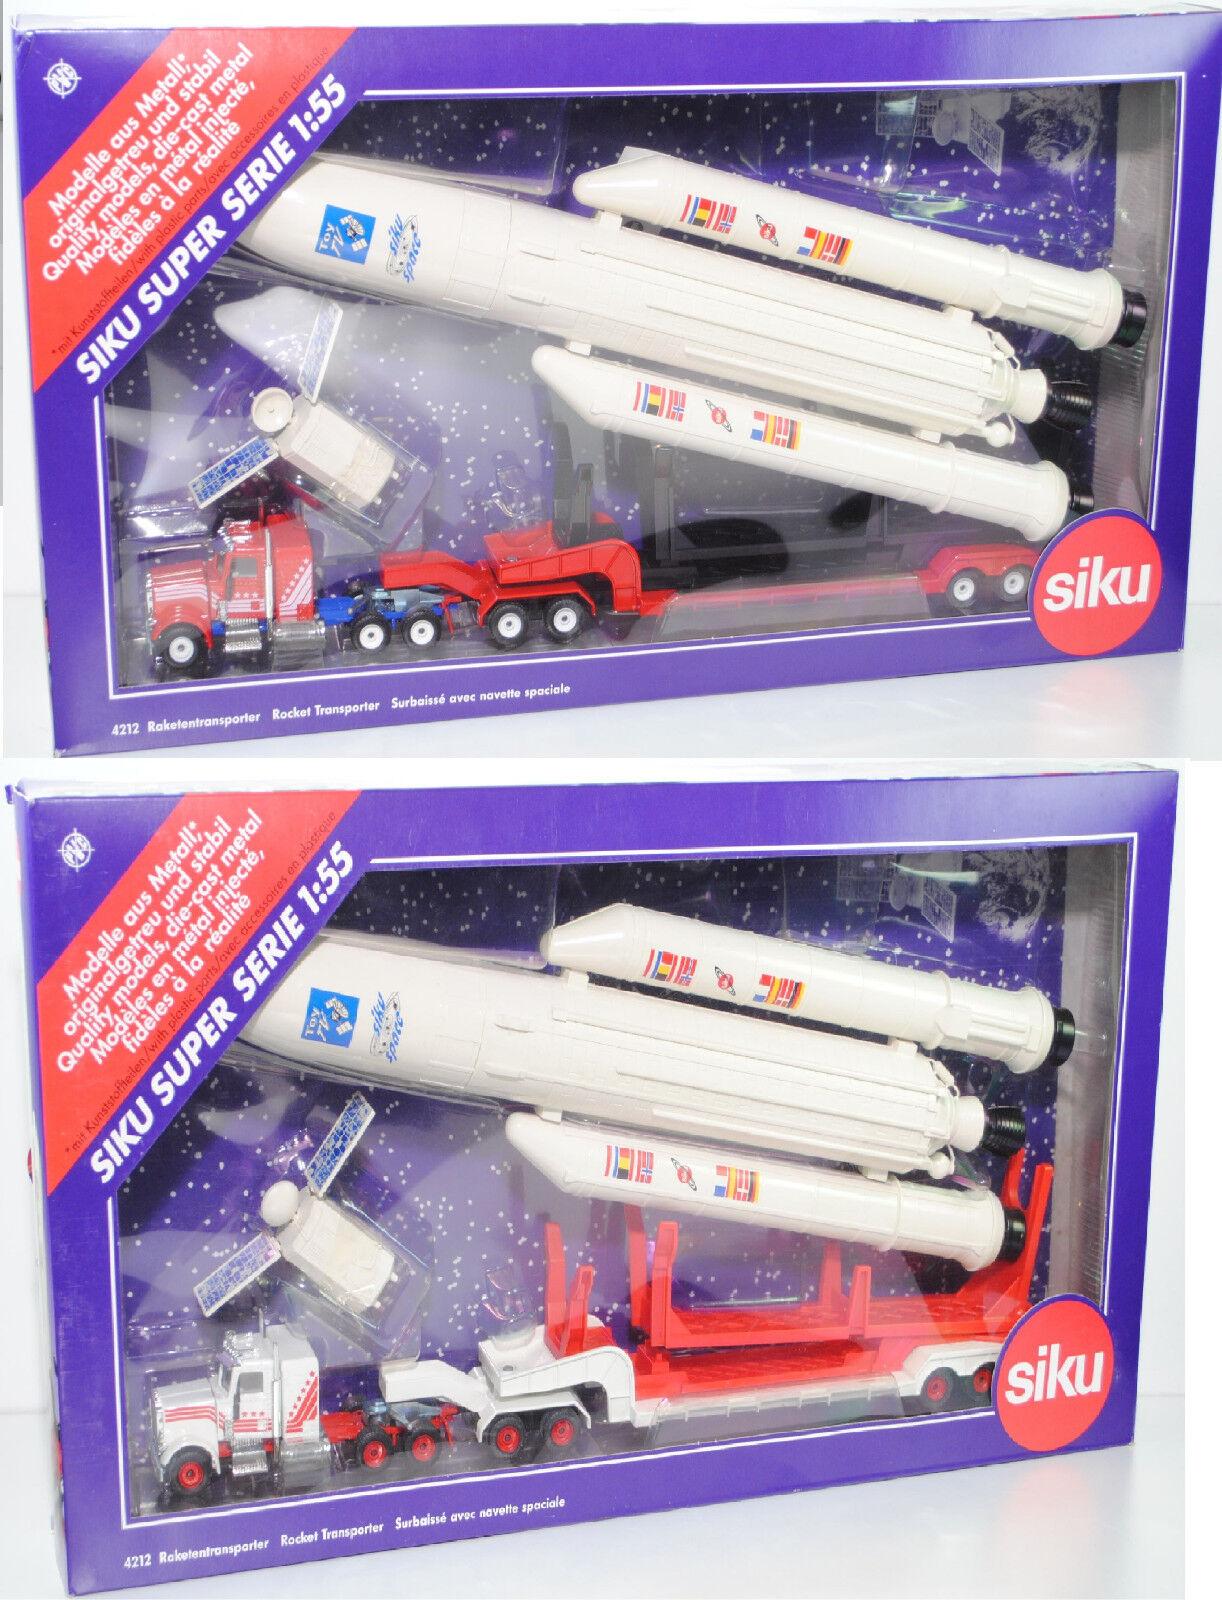 SIKU SUPER 4212 PETERBILT 359-127 Conventional missiles transporteur, SIKU Space